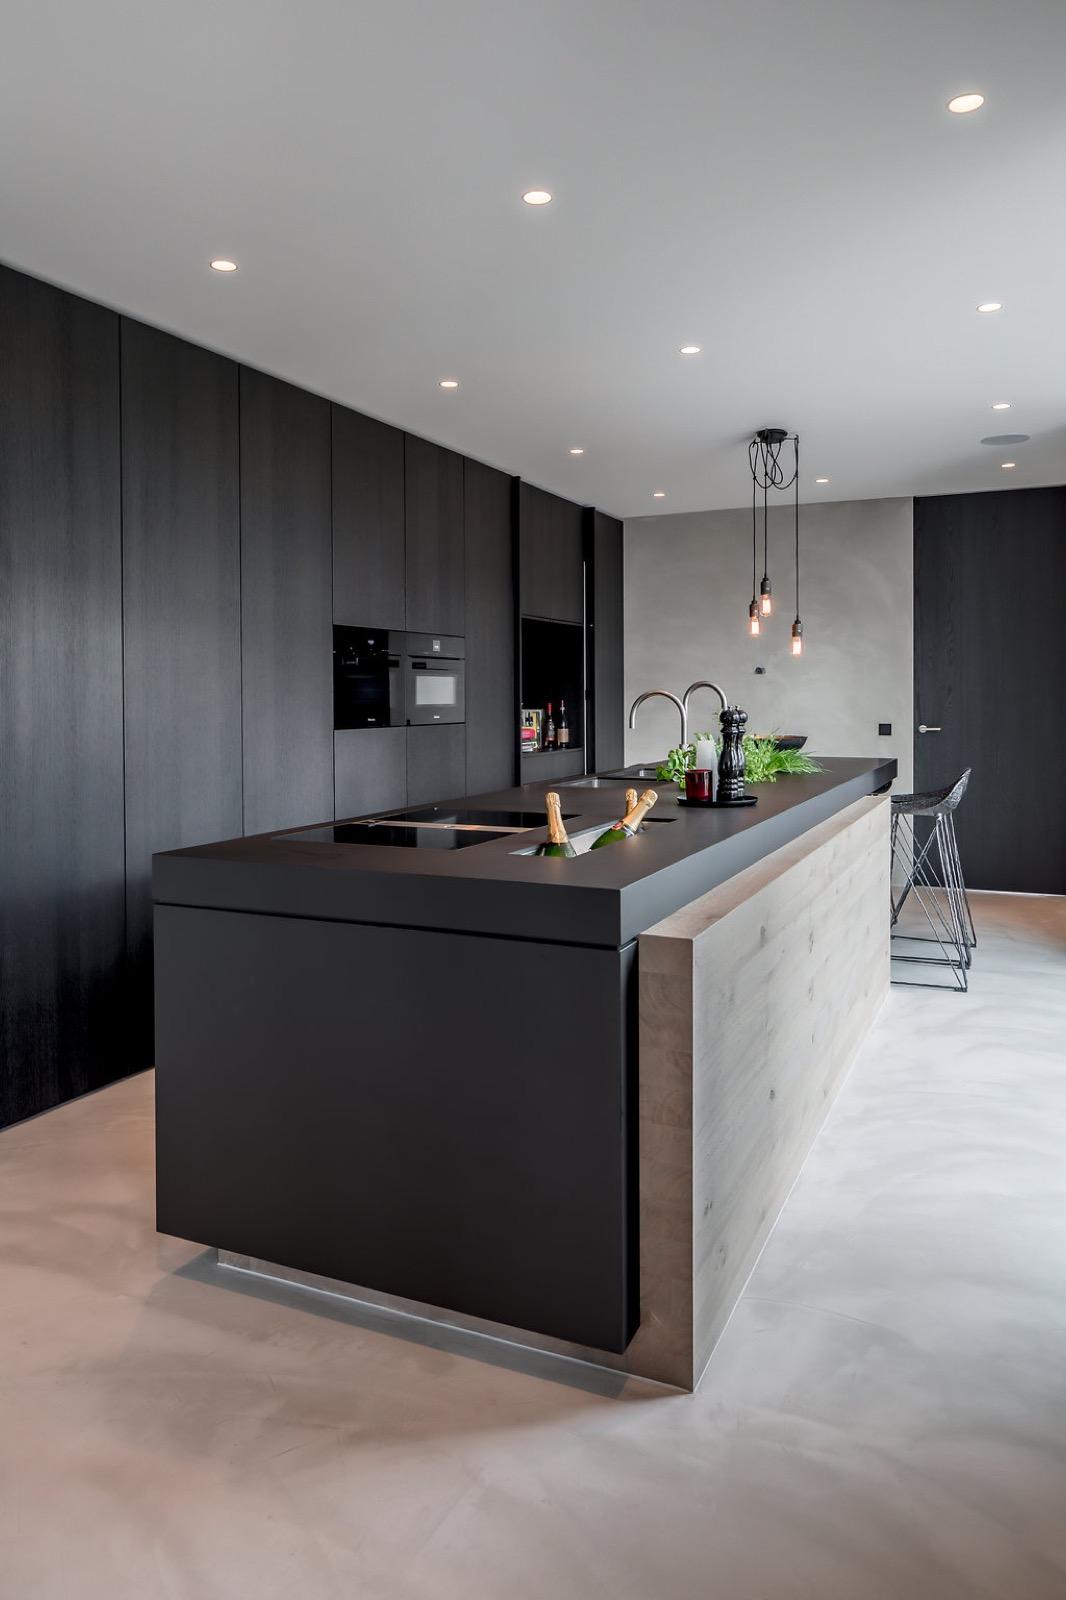 Cosmo condo kitchen showroom paris kitchens toronto - Kitchens